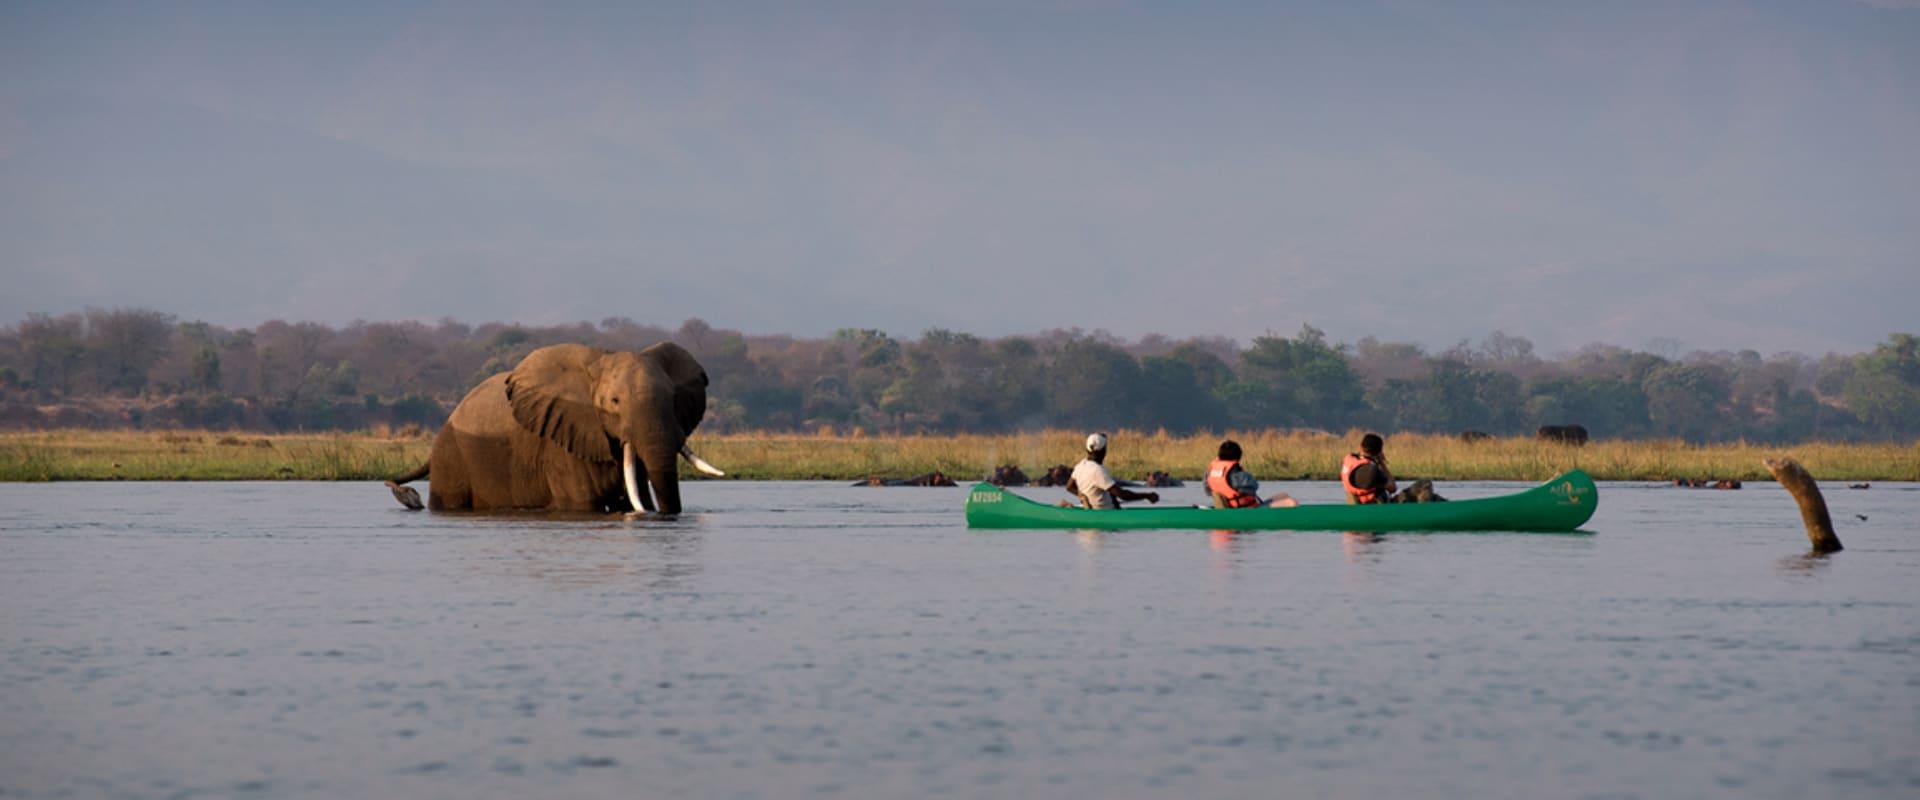 Enjoy a thrilling Zambezi canoe safari